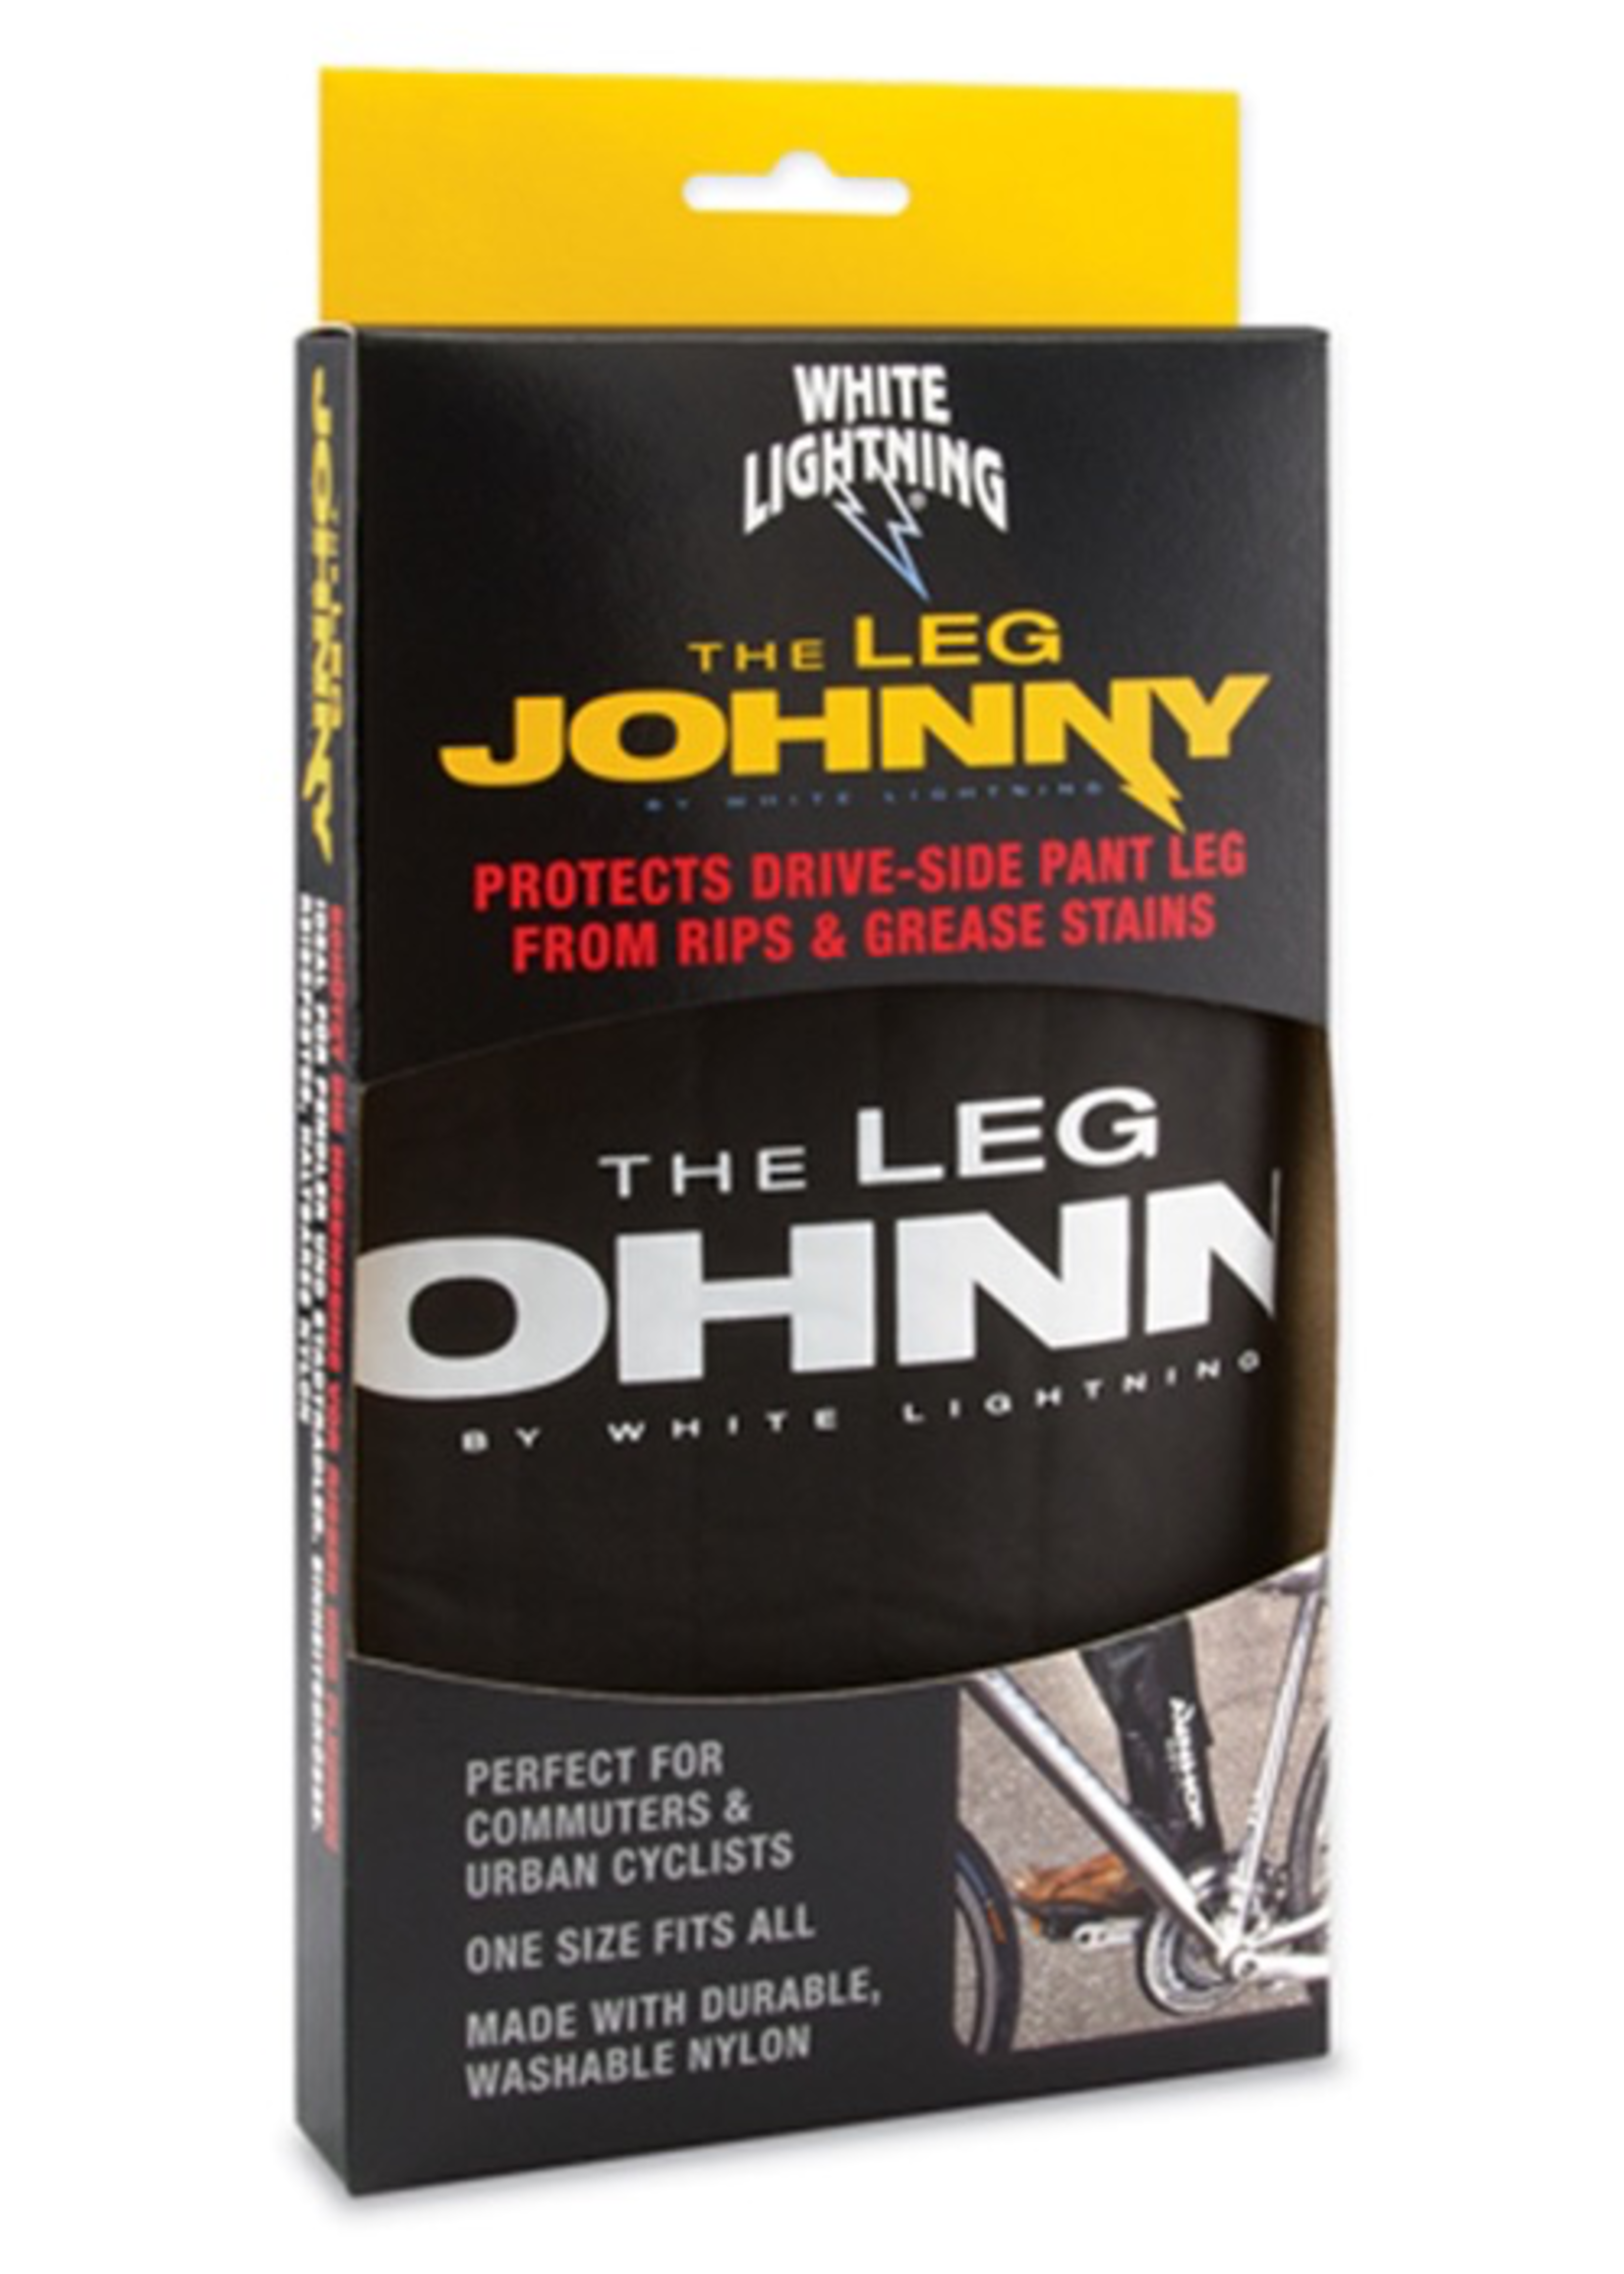 WHITE LIGHTIING - THE LEG JOHHNY